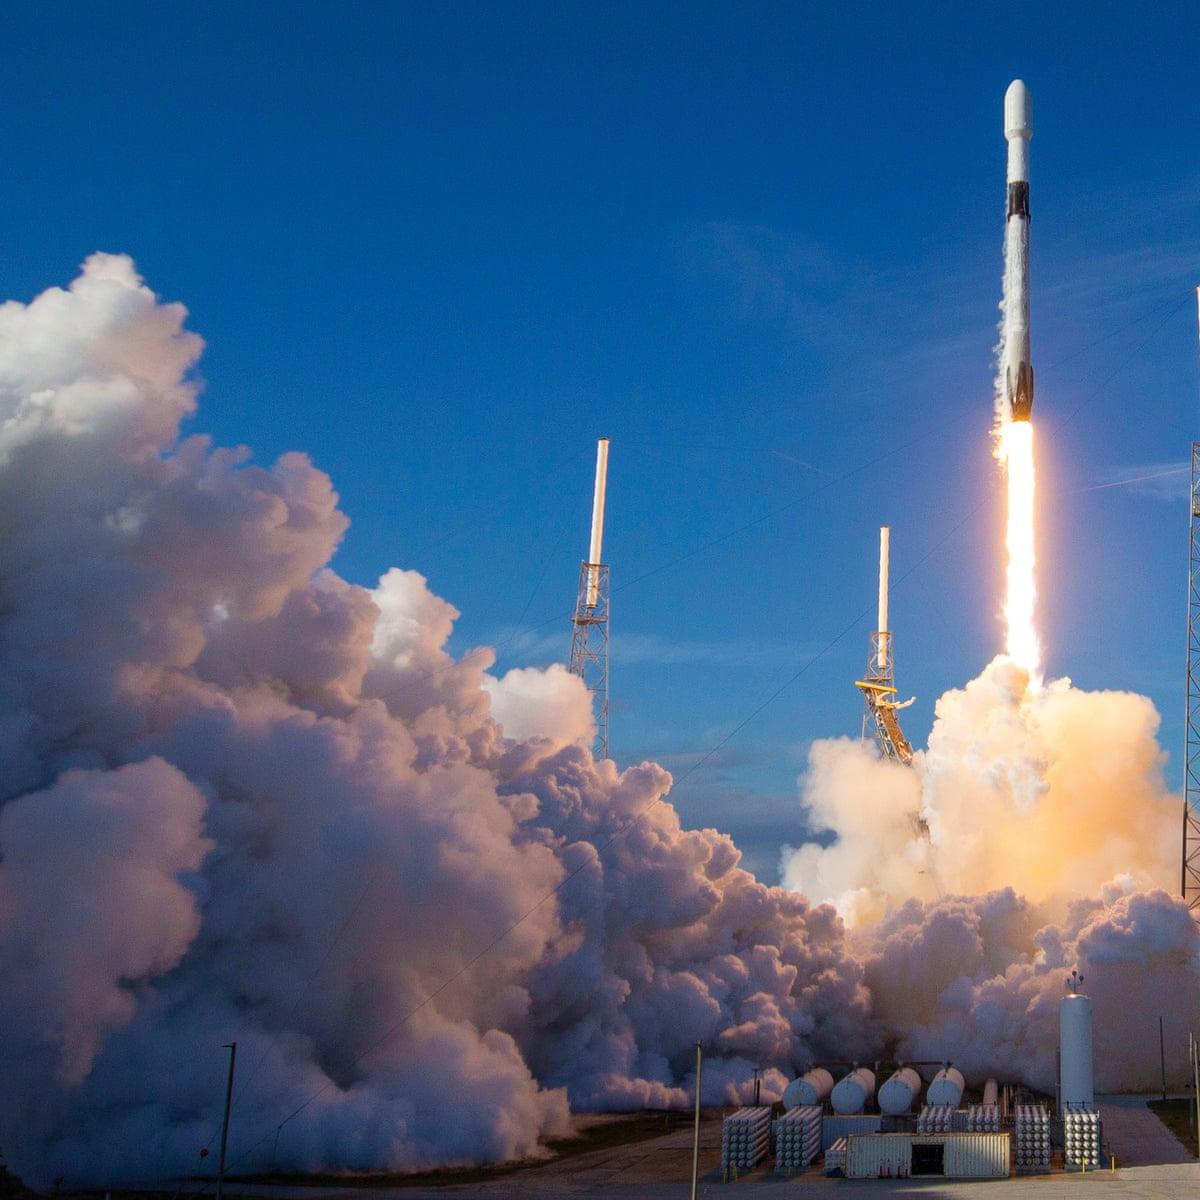 Elon Musk S Spacex Clears First Hurdle To Australian Broadband Market National Broadband Network Nbn The Guardian